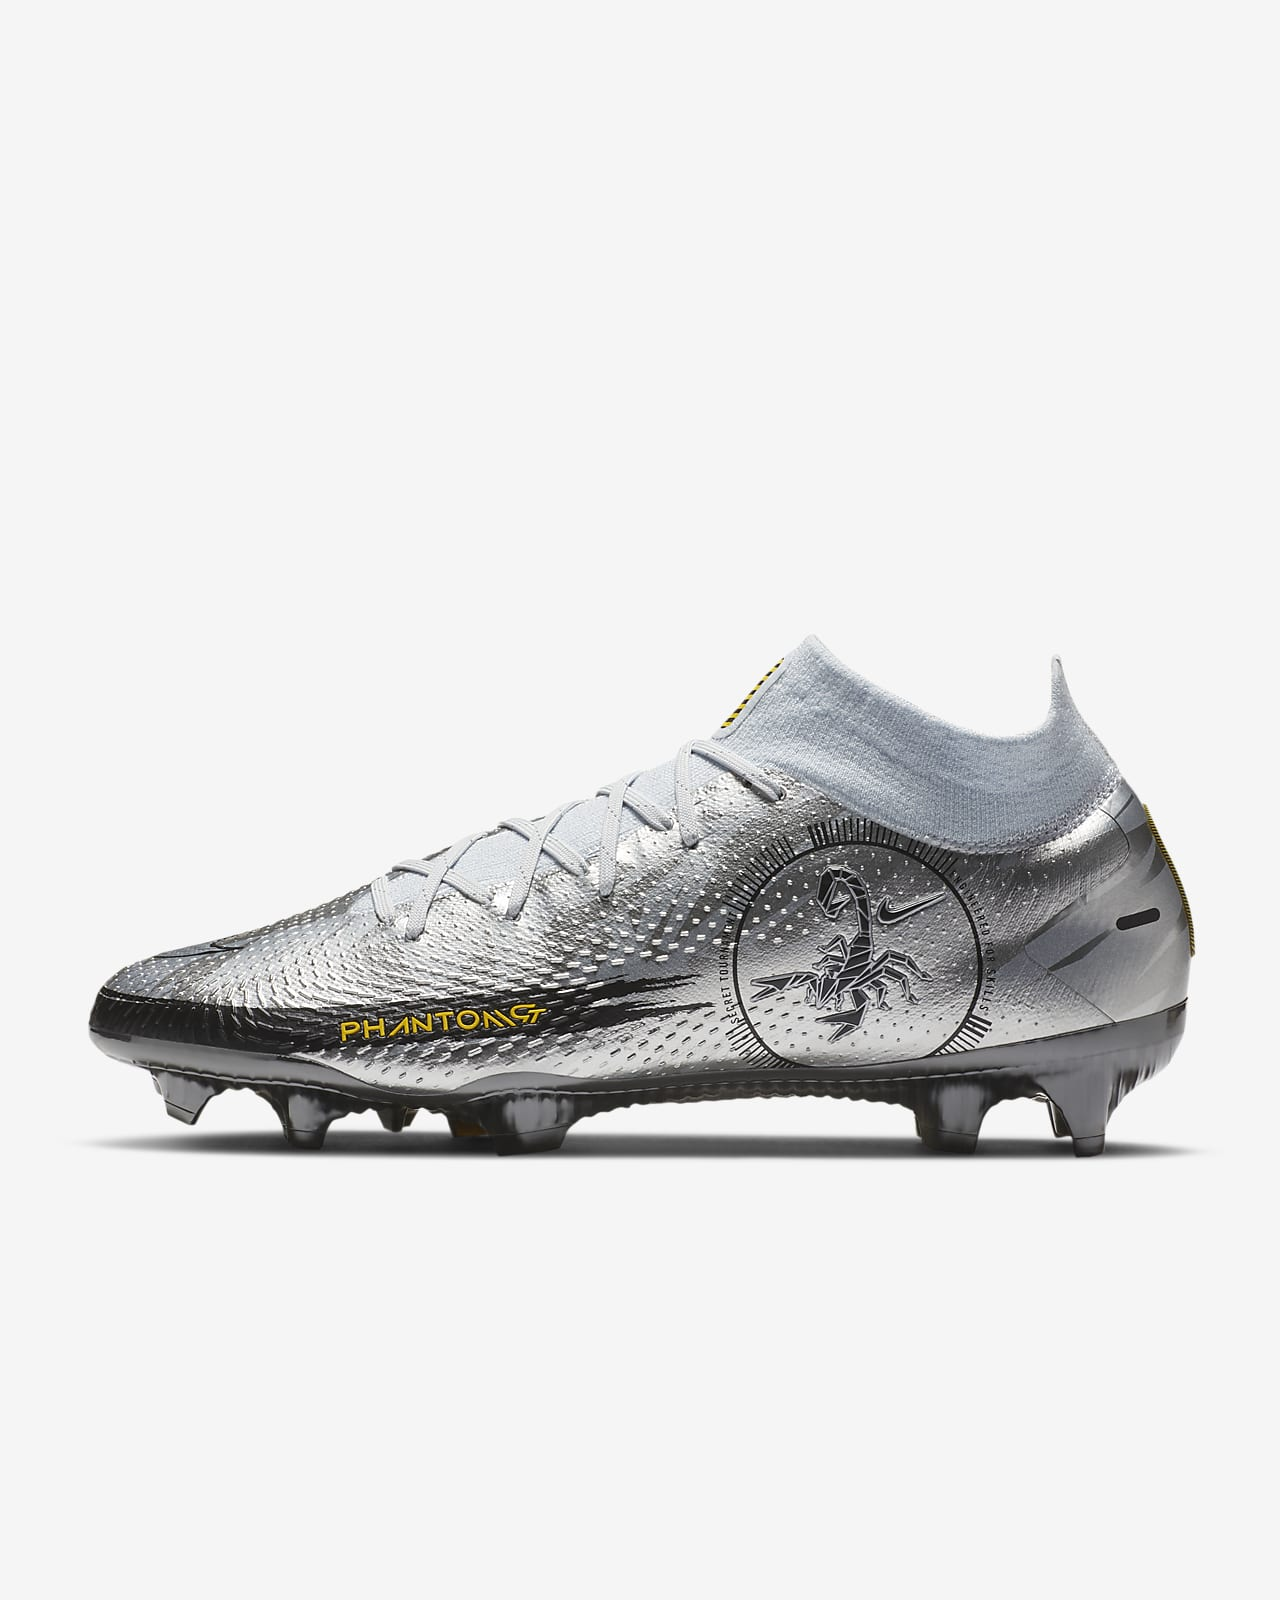 Calzado de fútbol para terreno firme Nike Phantom Scorpion Elite Dynamic Fit FG